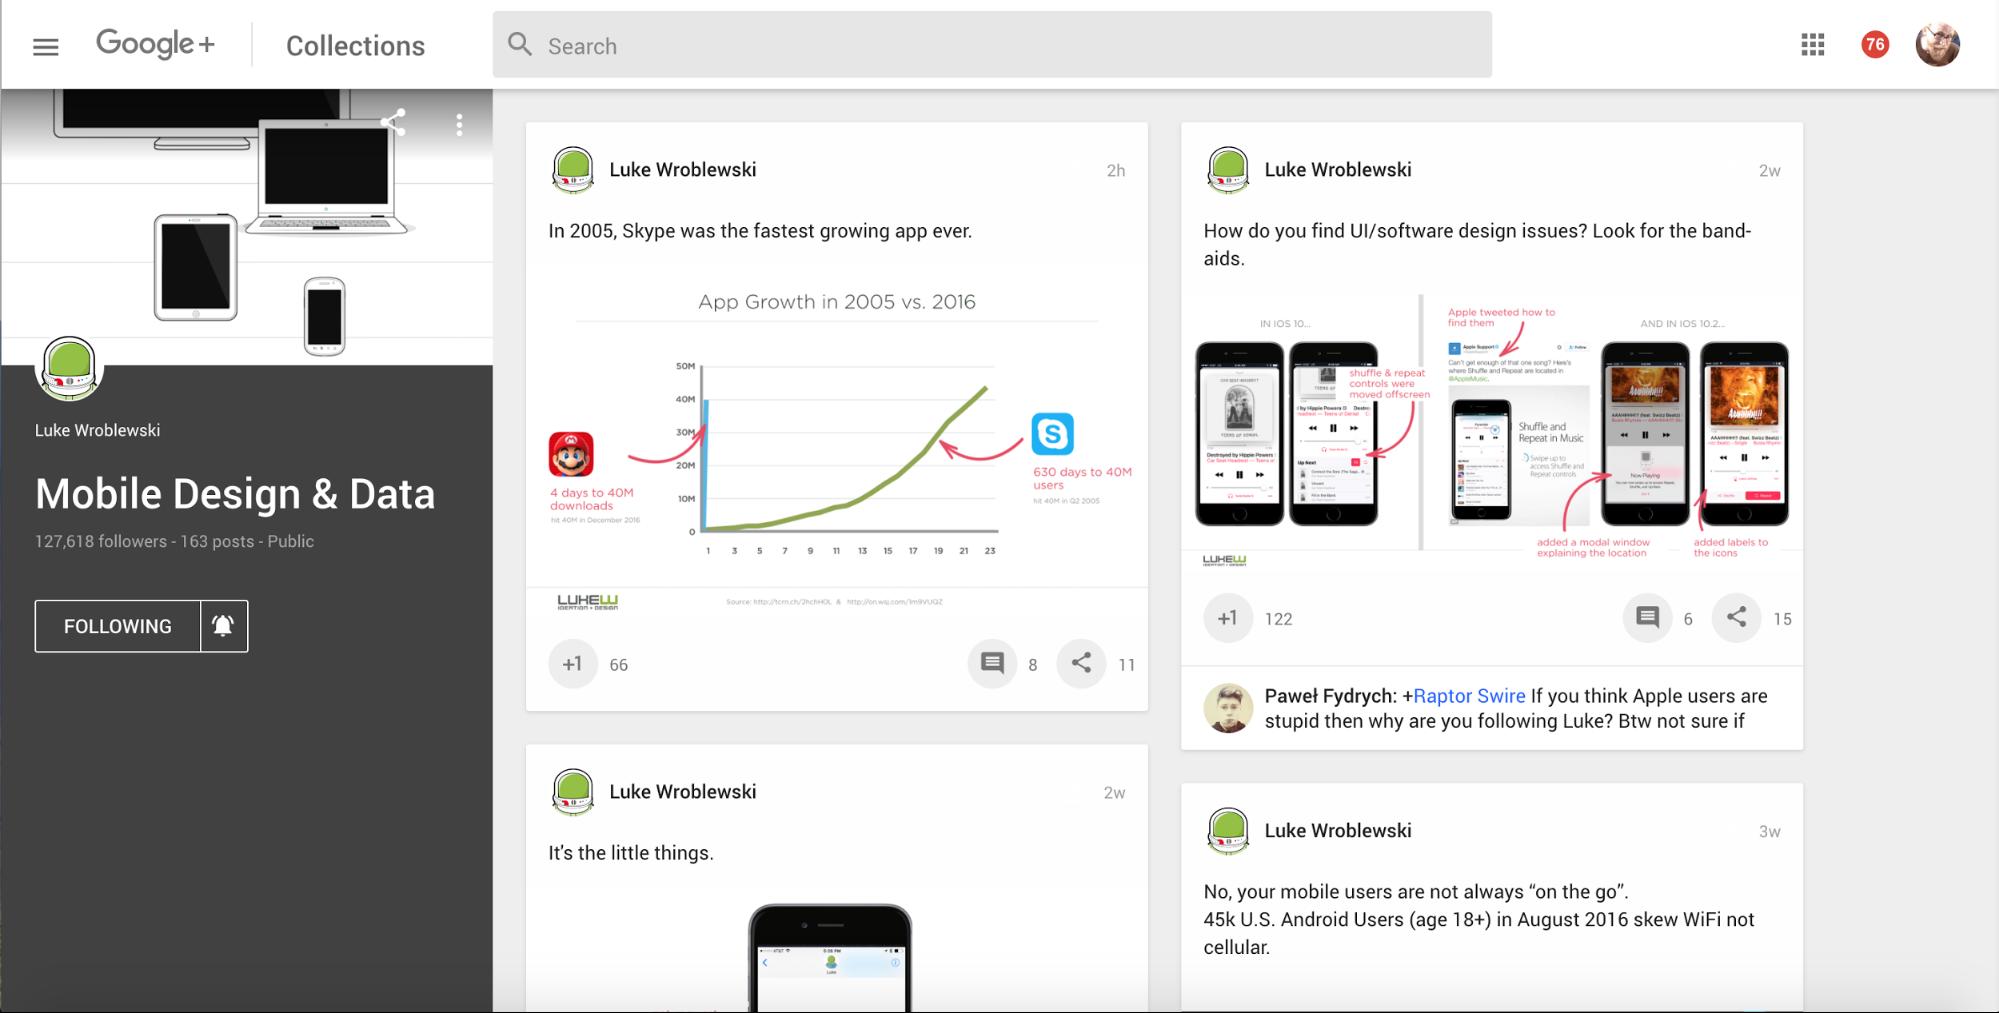 Mobile Design & Data Google+ Collection